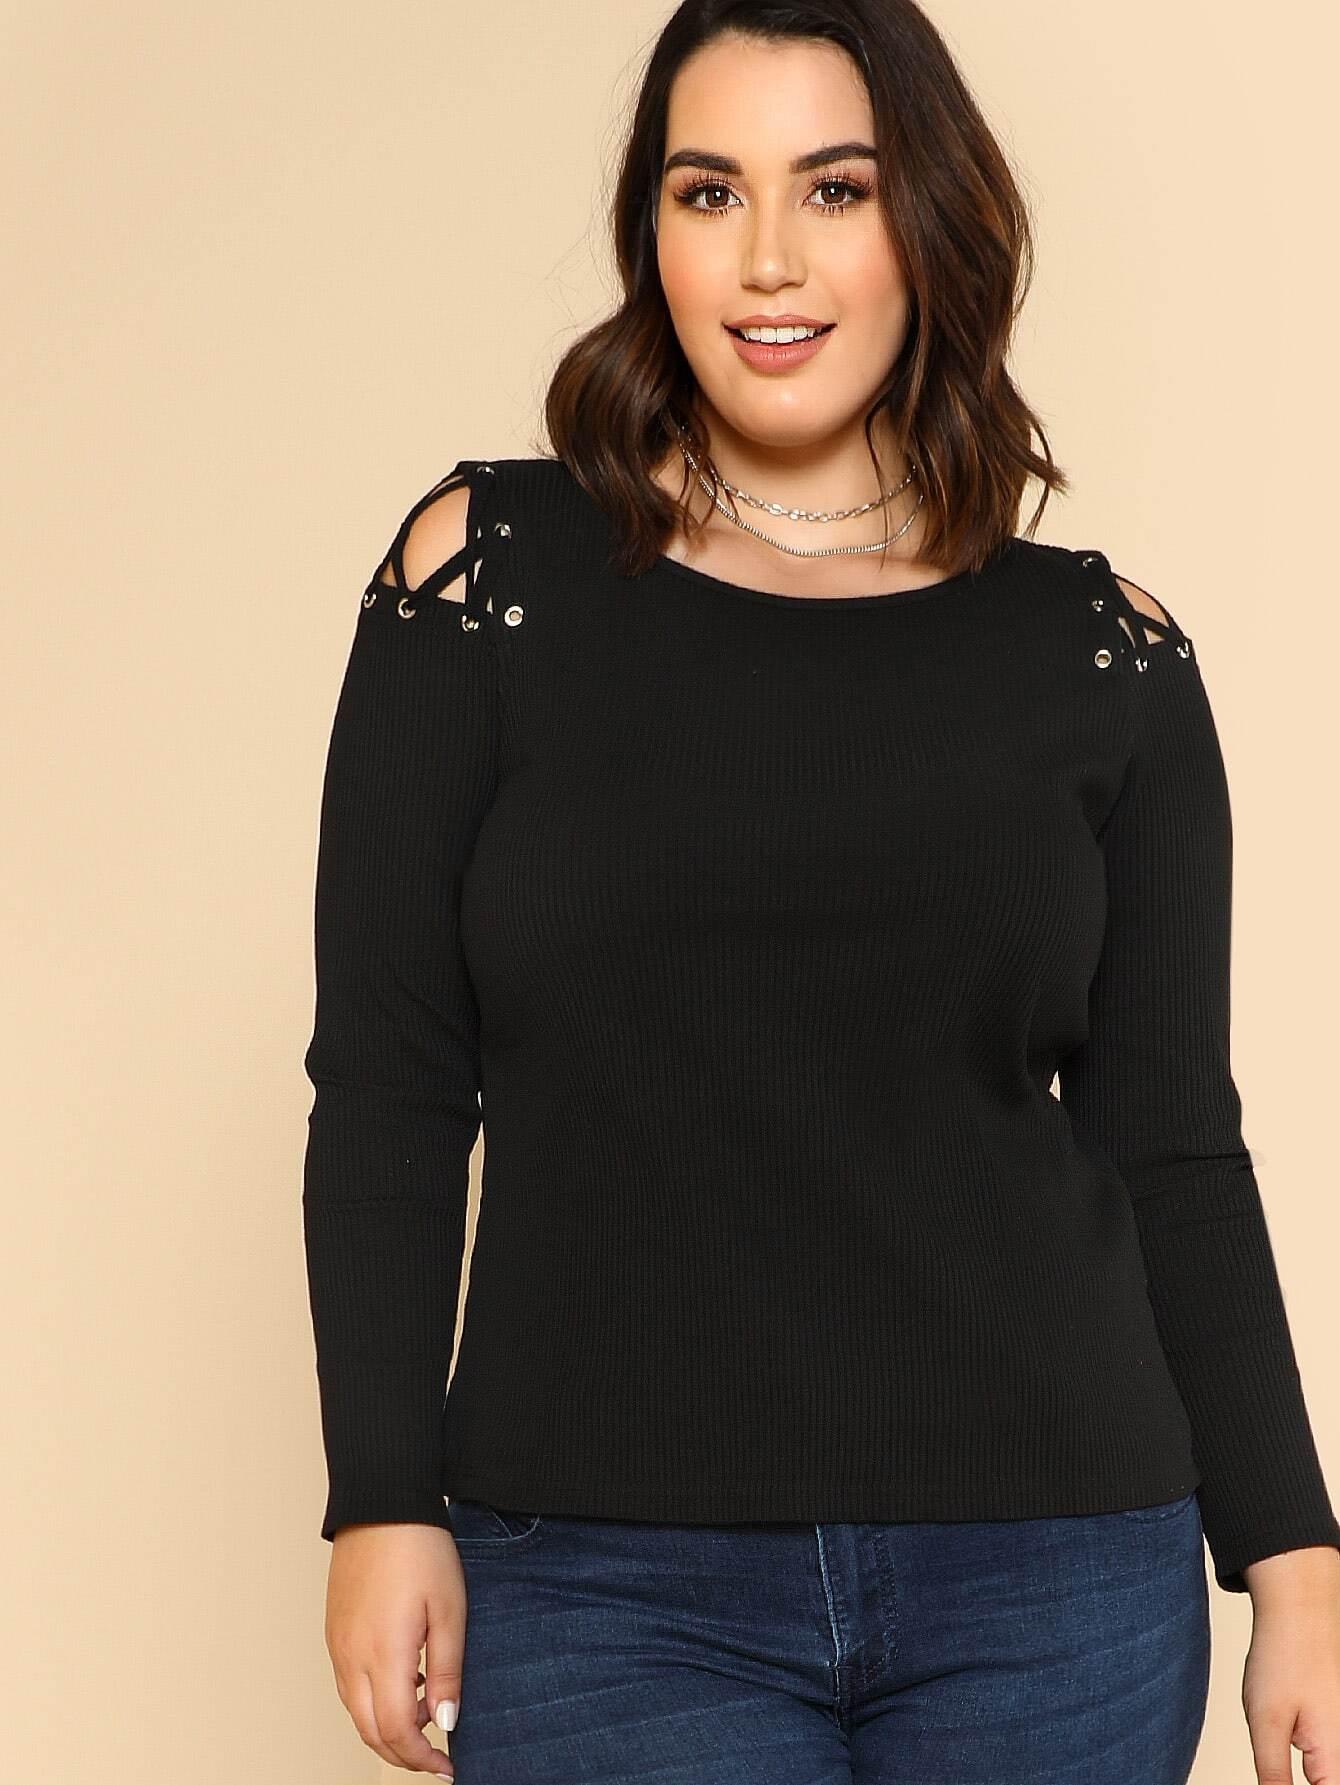 Cutout Crisscross Shoulder Rib Knit T-shirt tee171127706